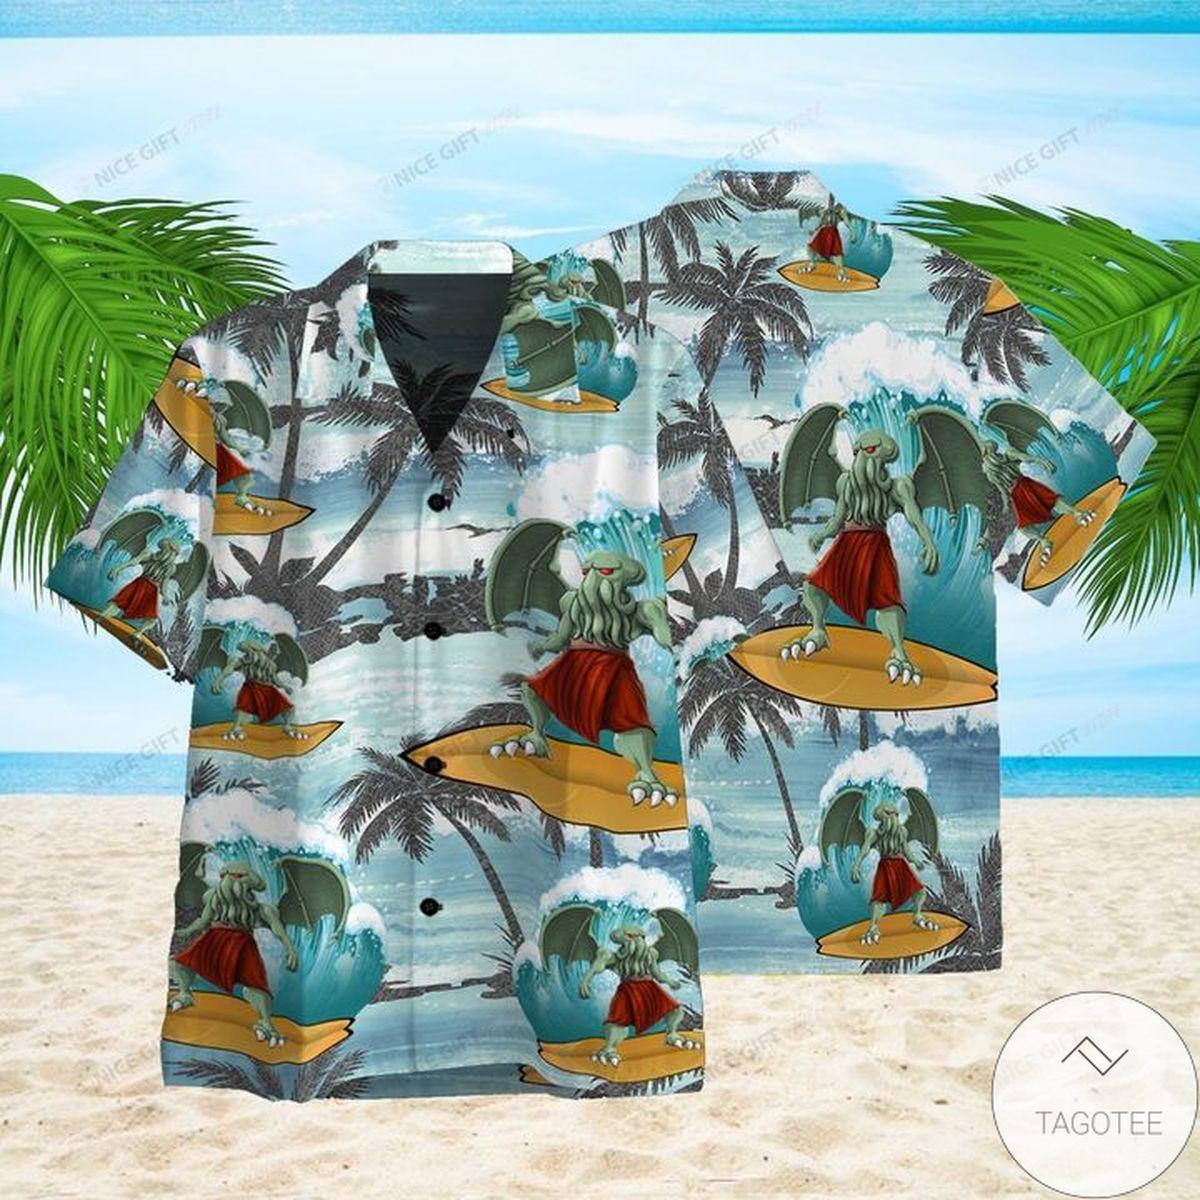 Mother's Day Gift Cthulhu Surfing Hawaiian Shirt